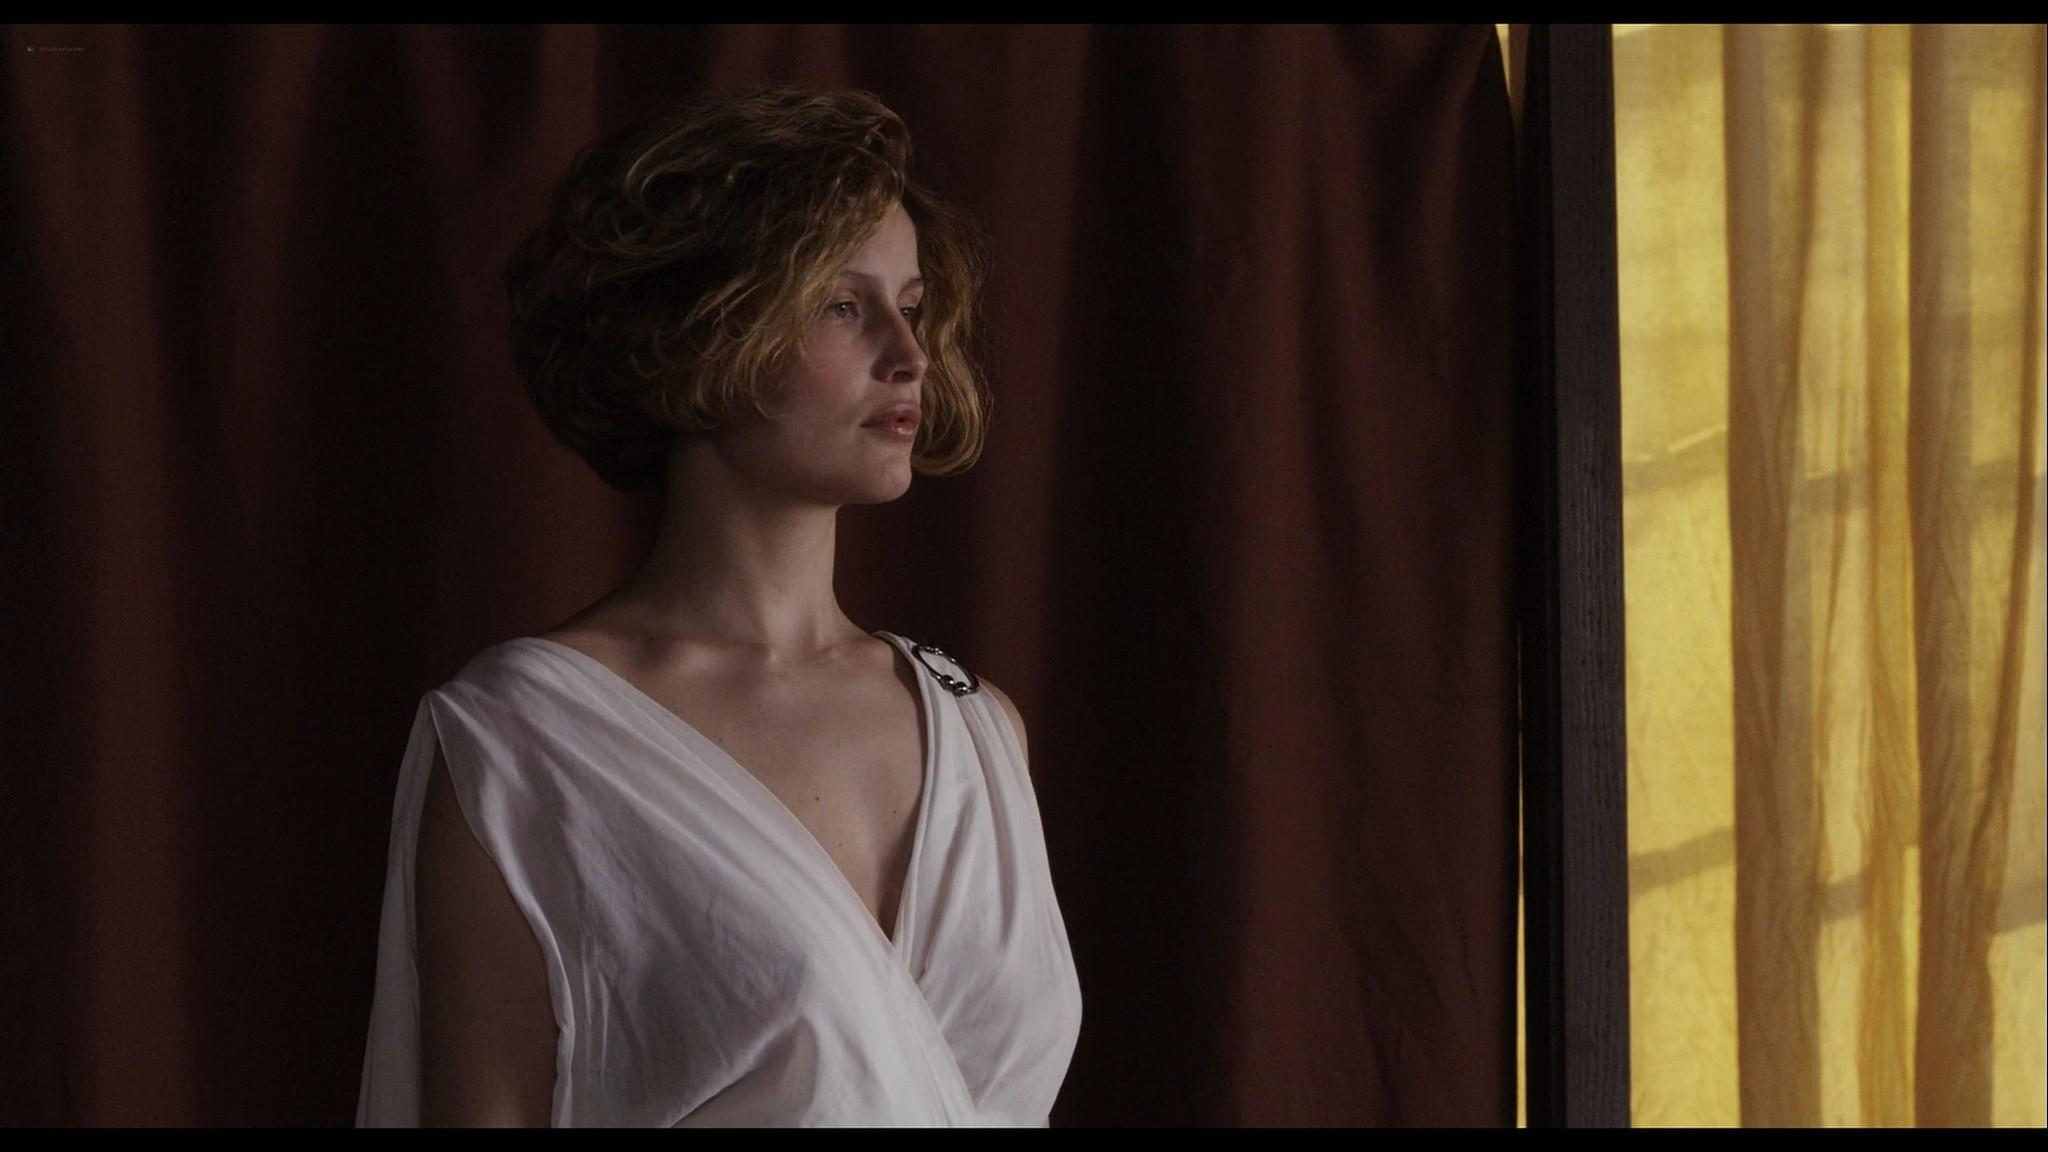 Laetitia Casta nude topless and very hot La jeune fille et les loups 2007 HD 1080p BluRay 2